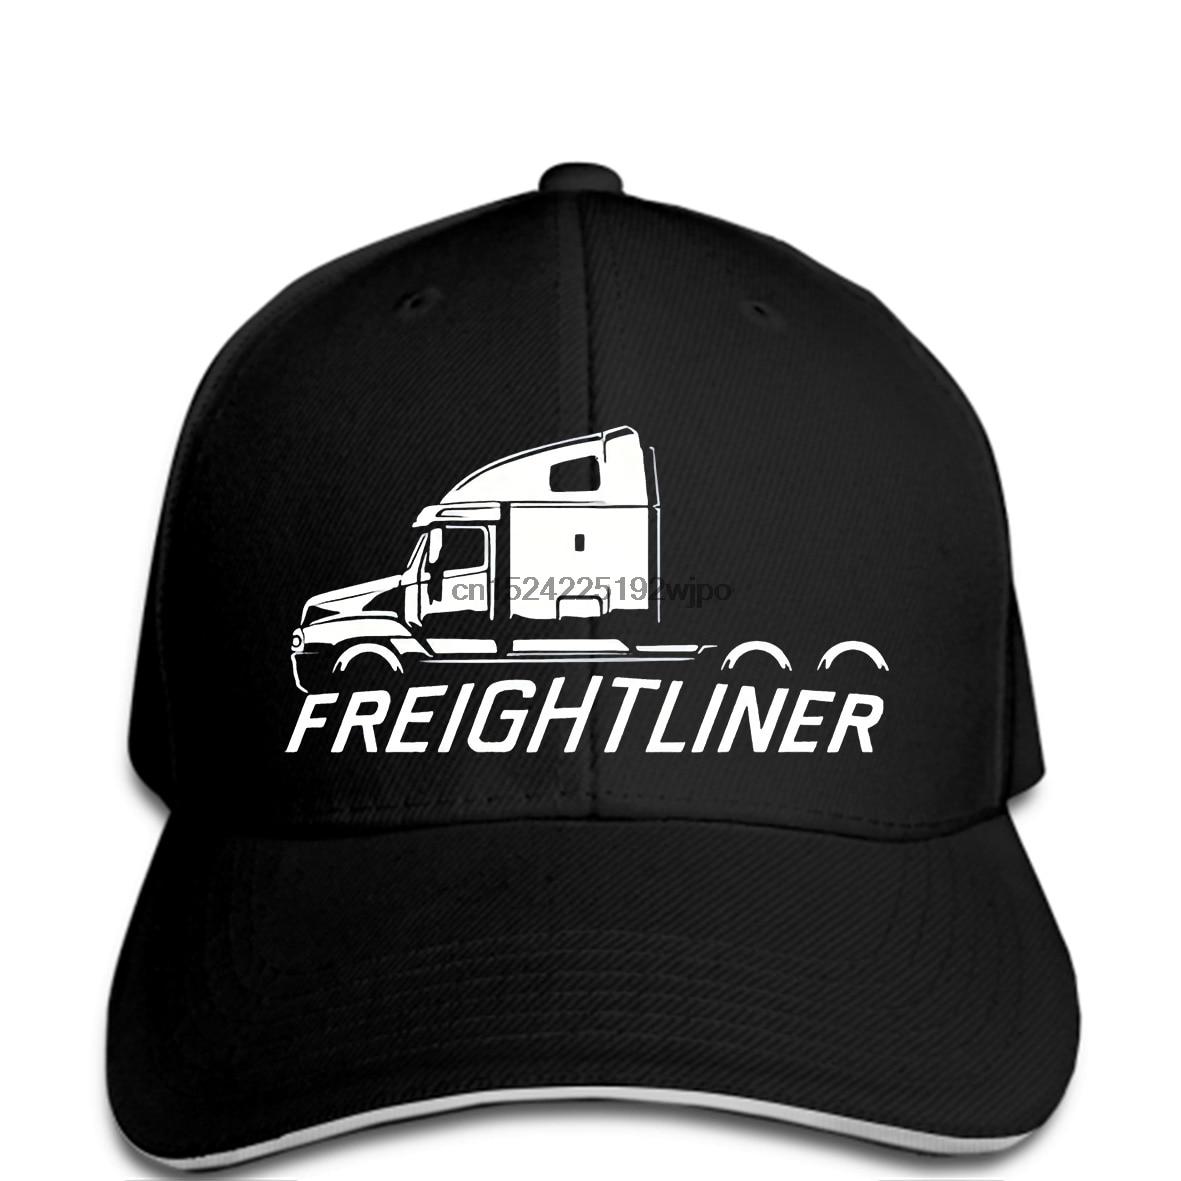 Men Baseball cap Freightliner Century Truck Classic Outline Design cap  funny cap novelty cap women cf3c429f8d68